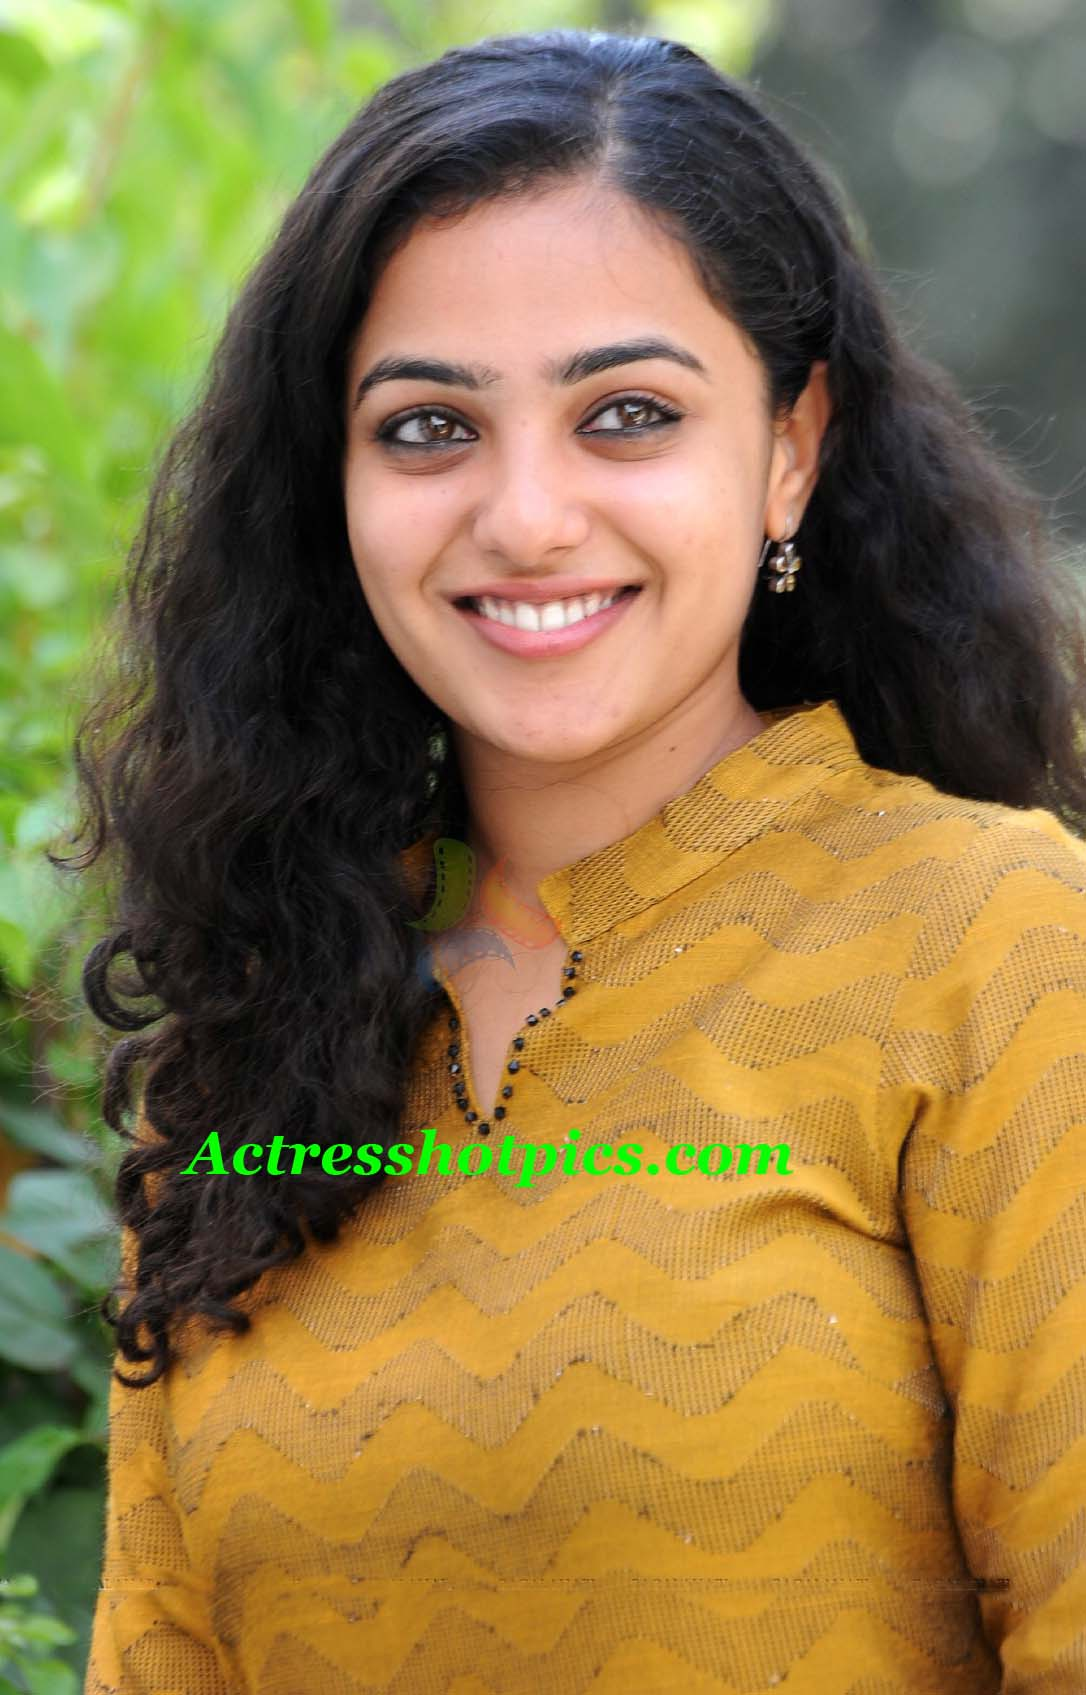 nithin upcoming movie ishq actress nithya menon cute smiling stills ... Menon sexi posters, Beautiful Nithya Menon unseen spicy bikini pictures ...